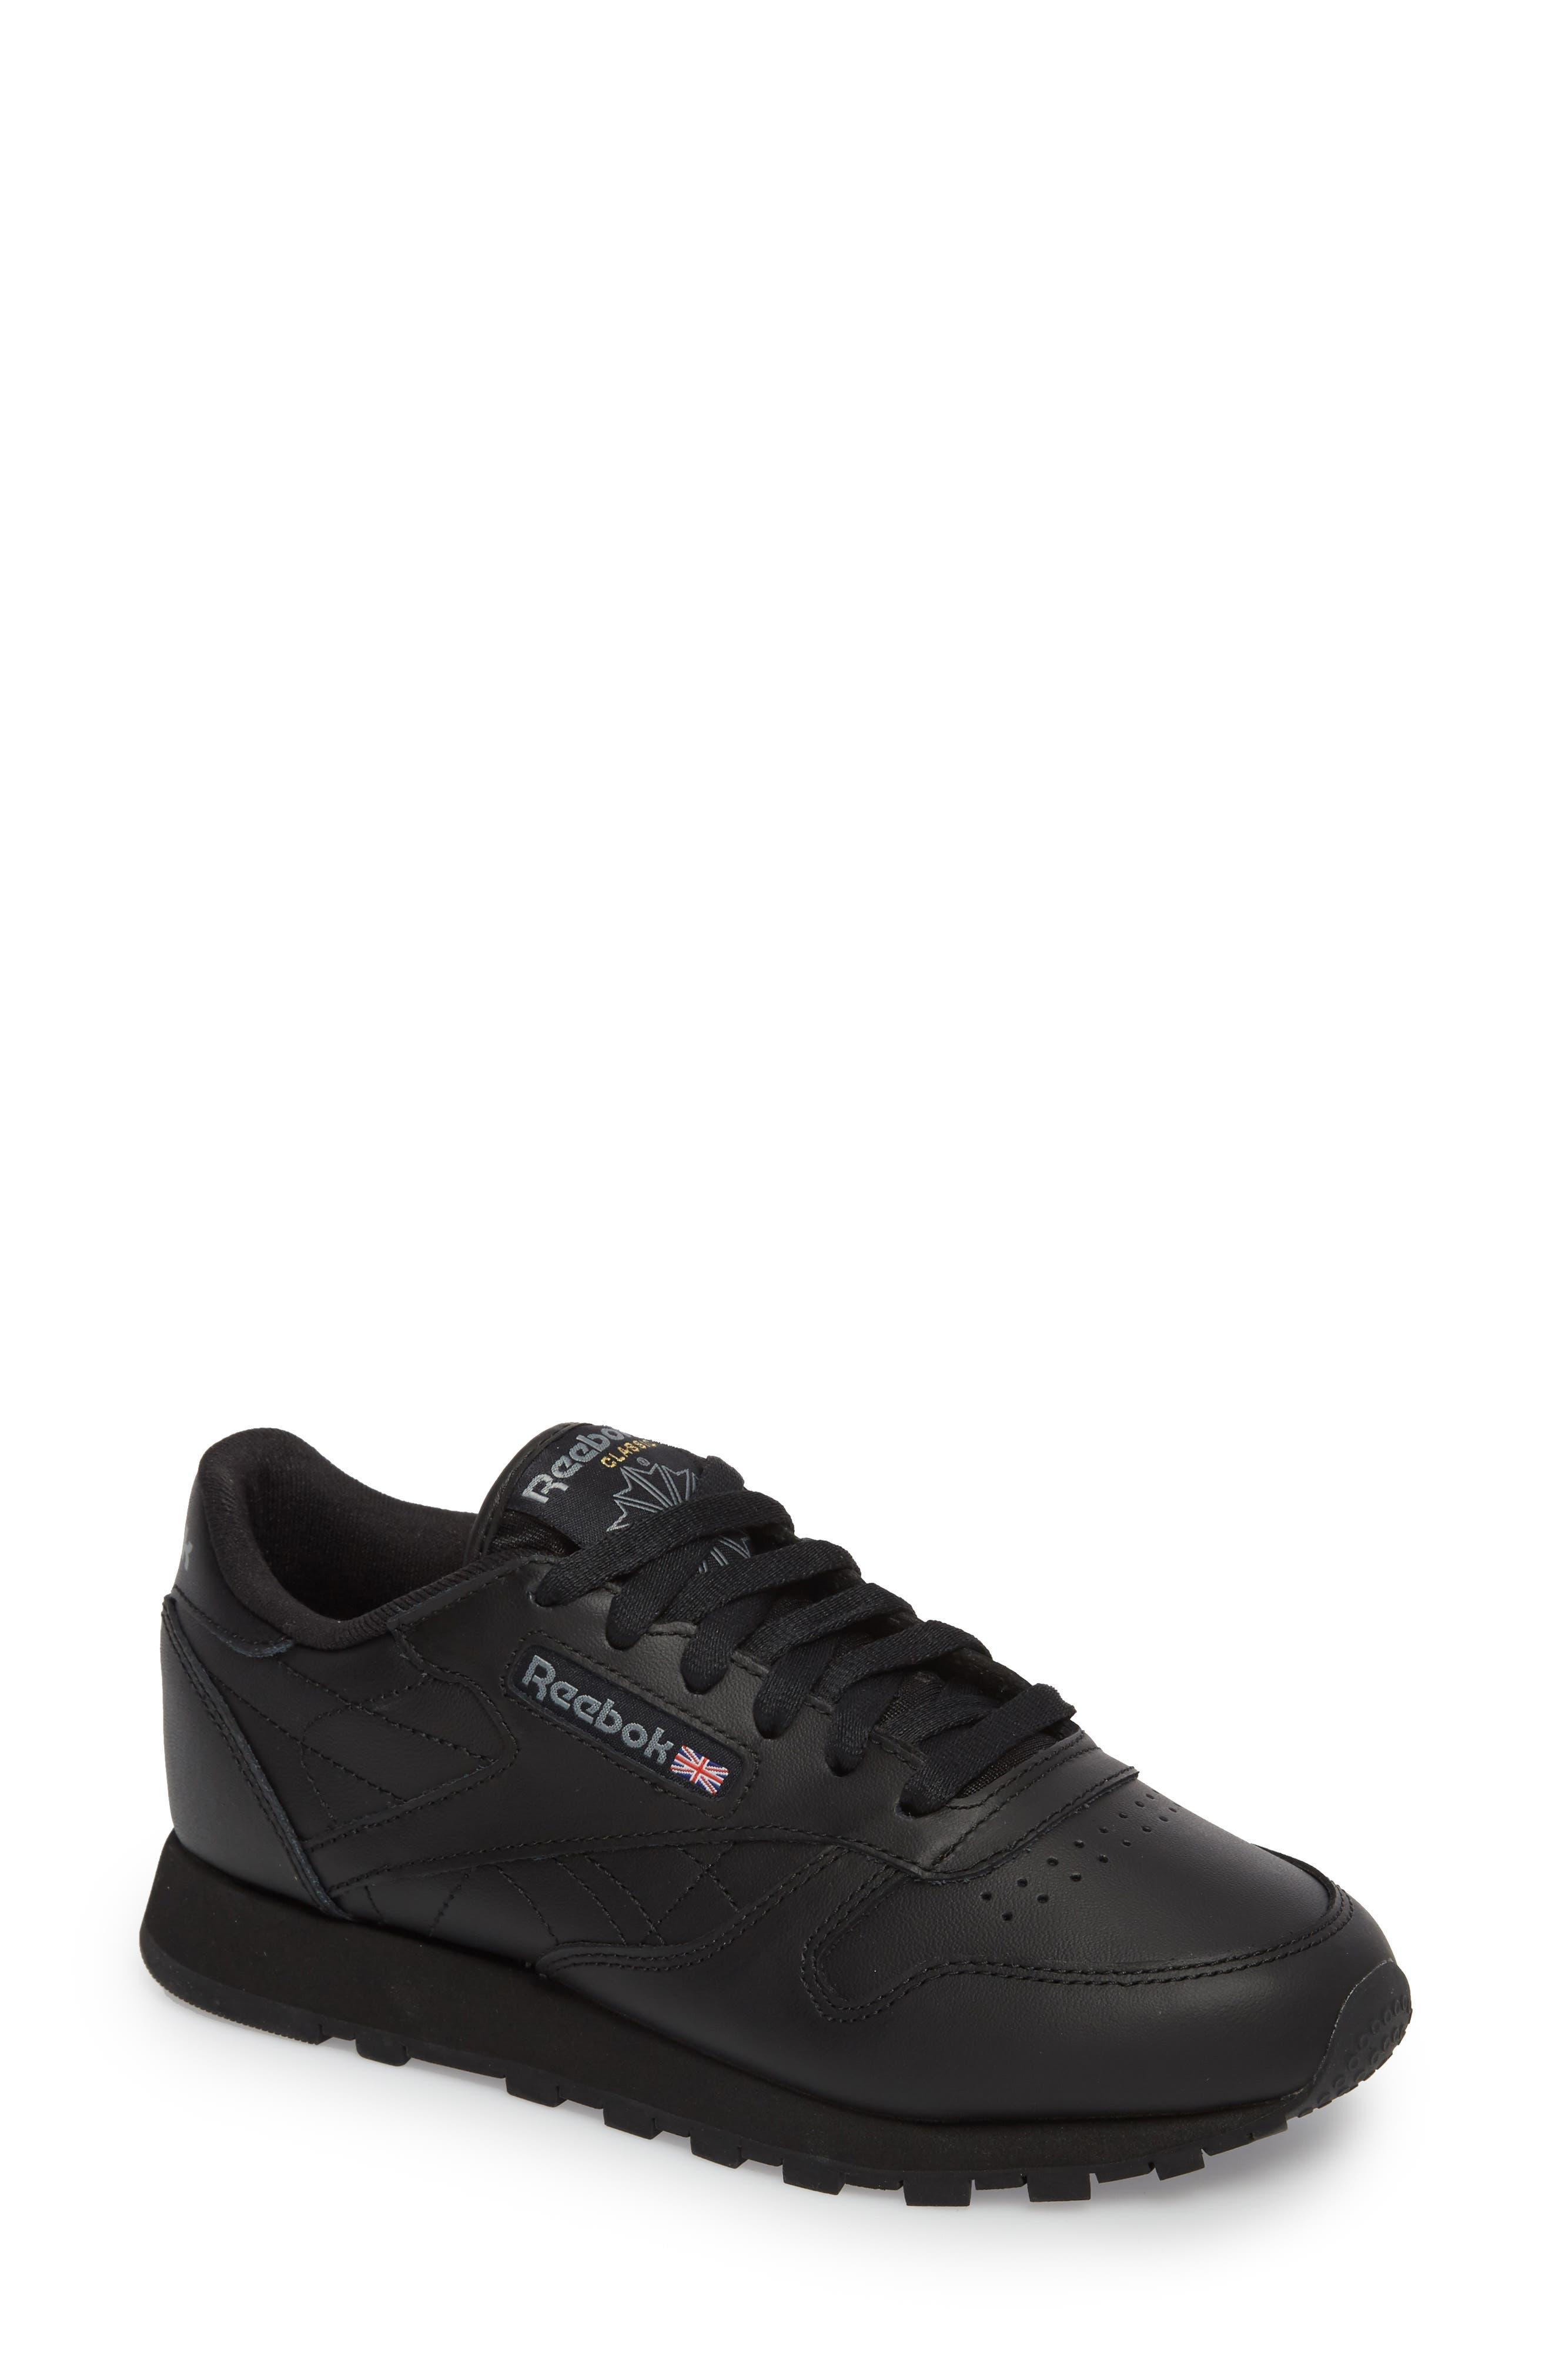 Alternate Image 1 Selected - Reebok Classic Leather Sneaker (Women)